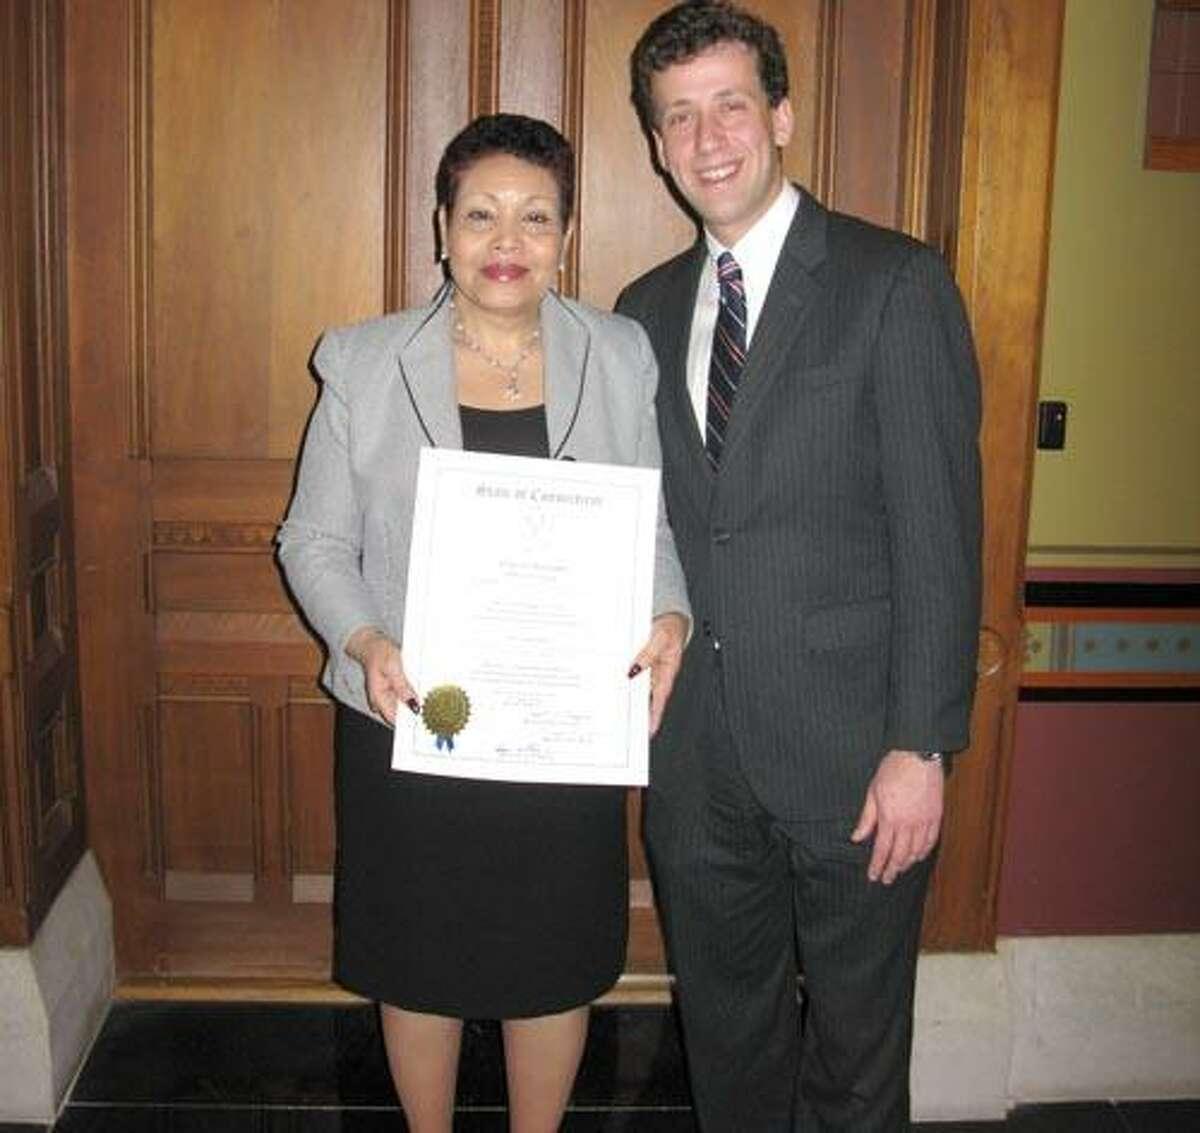 Rosa Browne with Matt Lesser